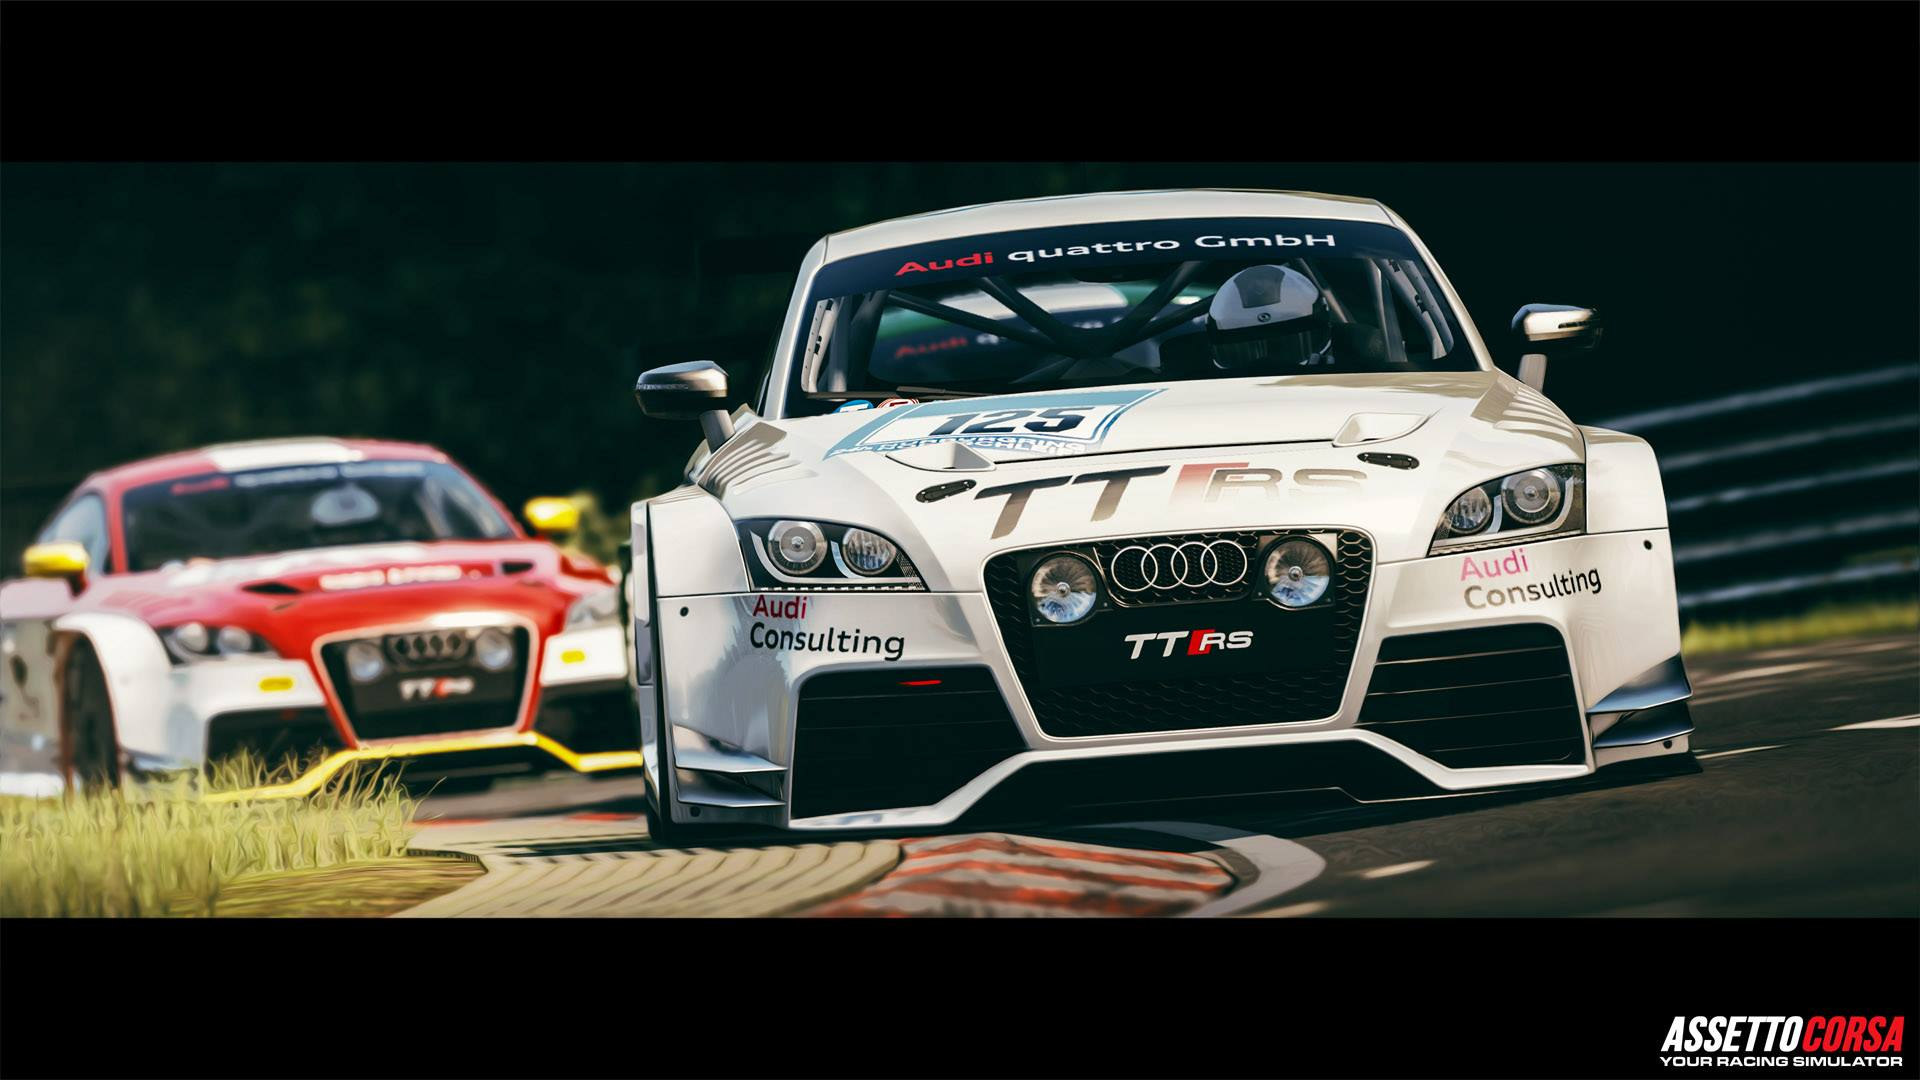 Assetto Corsa Ready To Race DLC Audi TT RS (VLN)